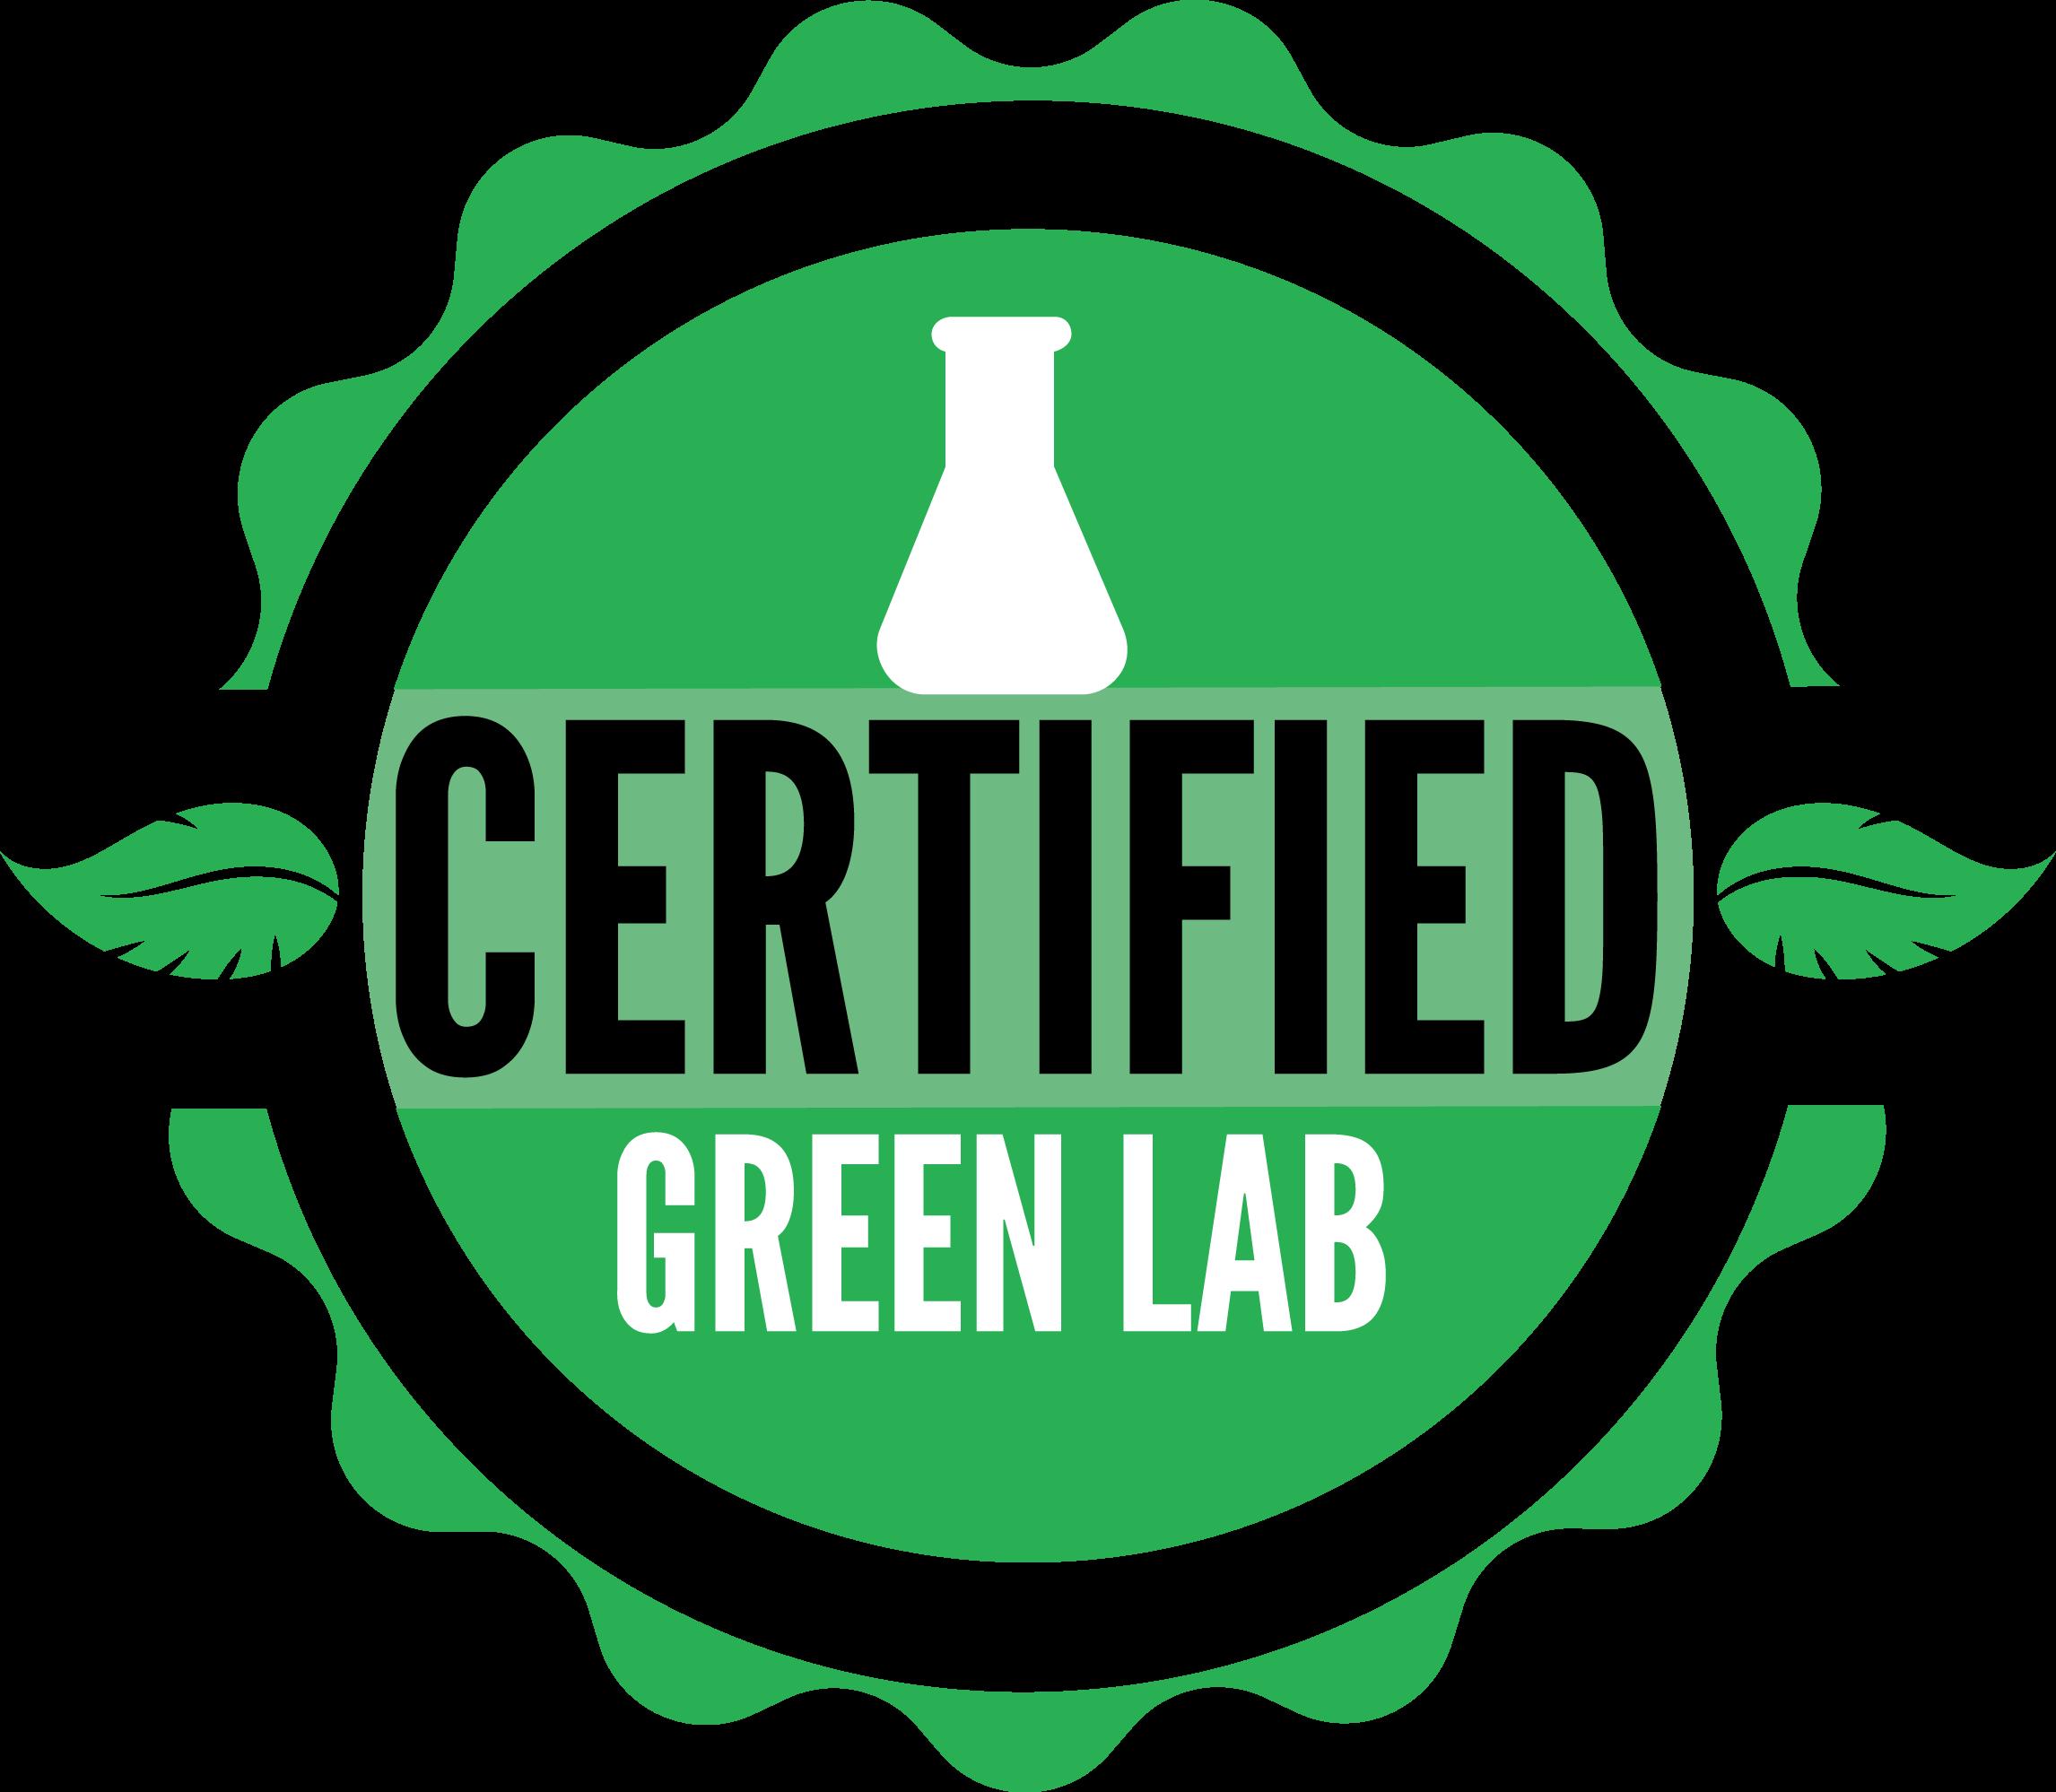 Certified Green Lab Program Illinois